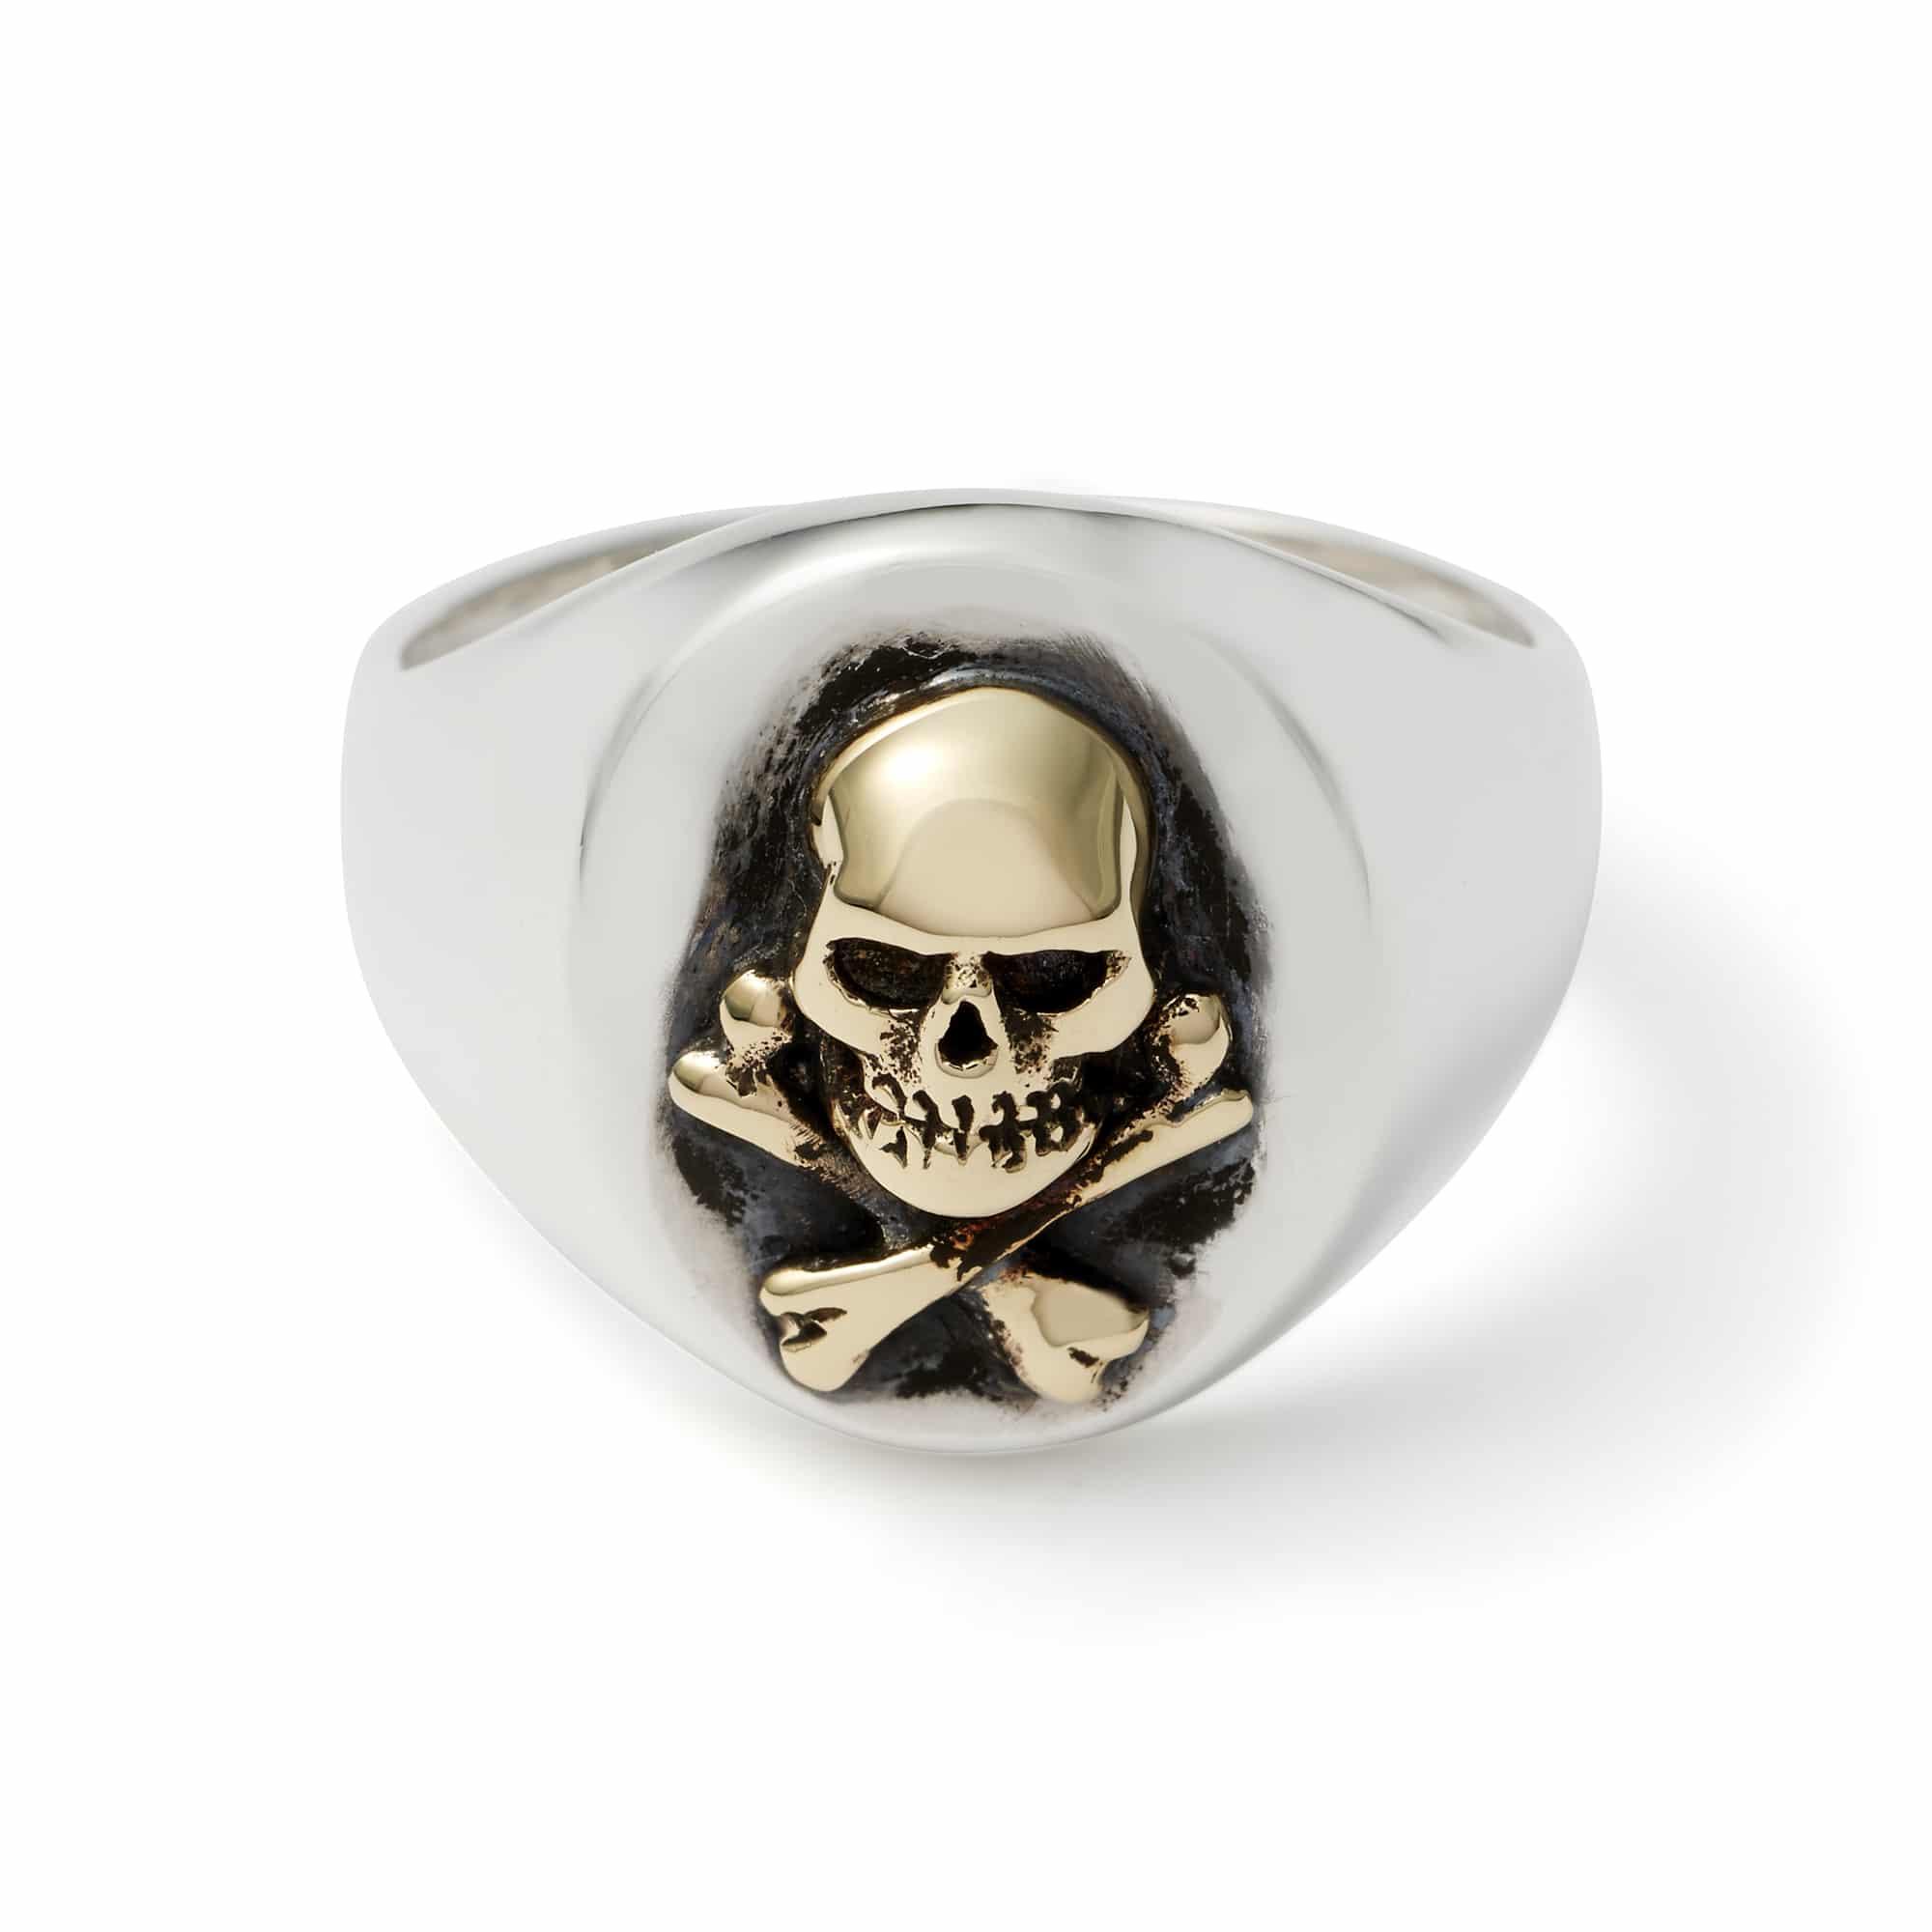 Gold Skull Amp Crossbones Signet Ring The Great Frog